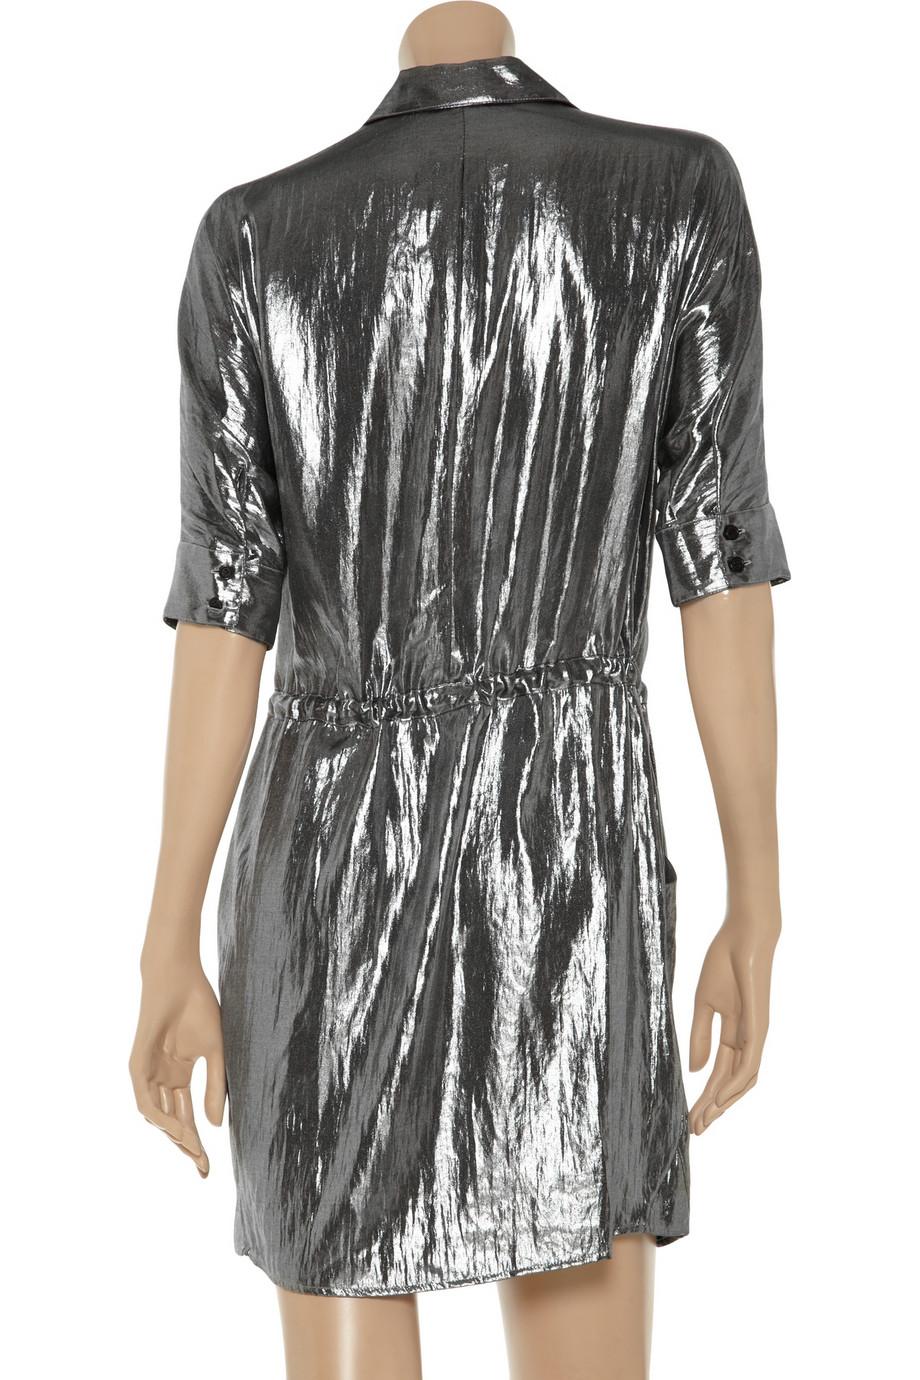 Lyst Bcbgmaxazria Metallic Shirt Dress In Metallic